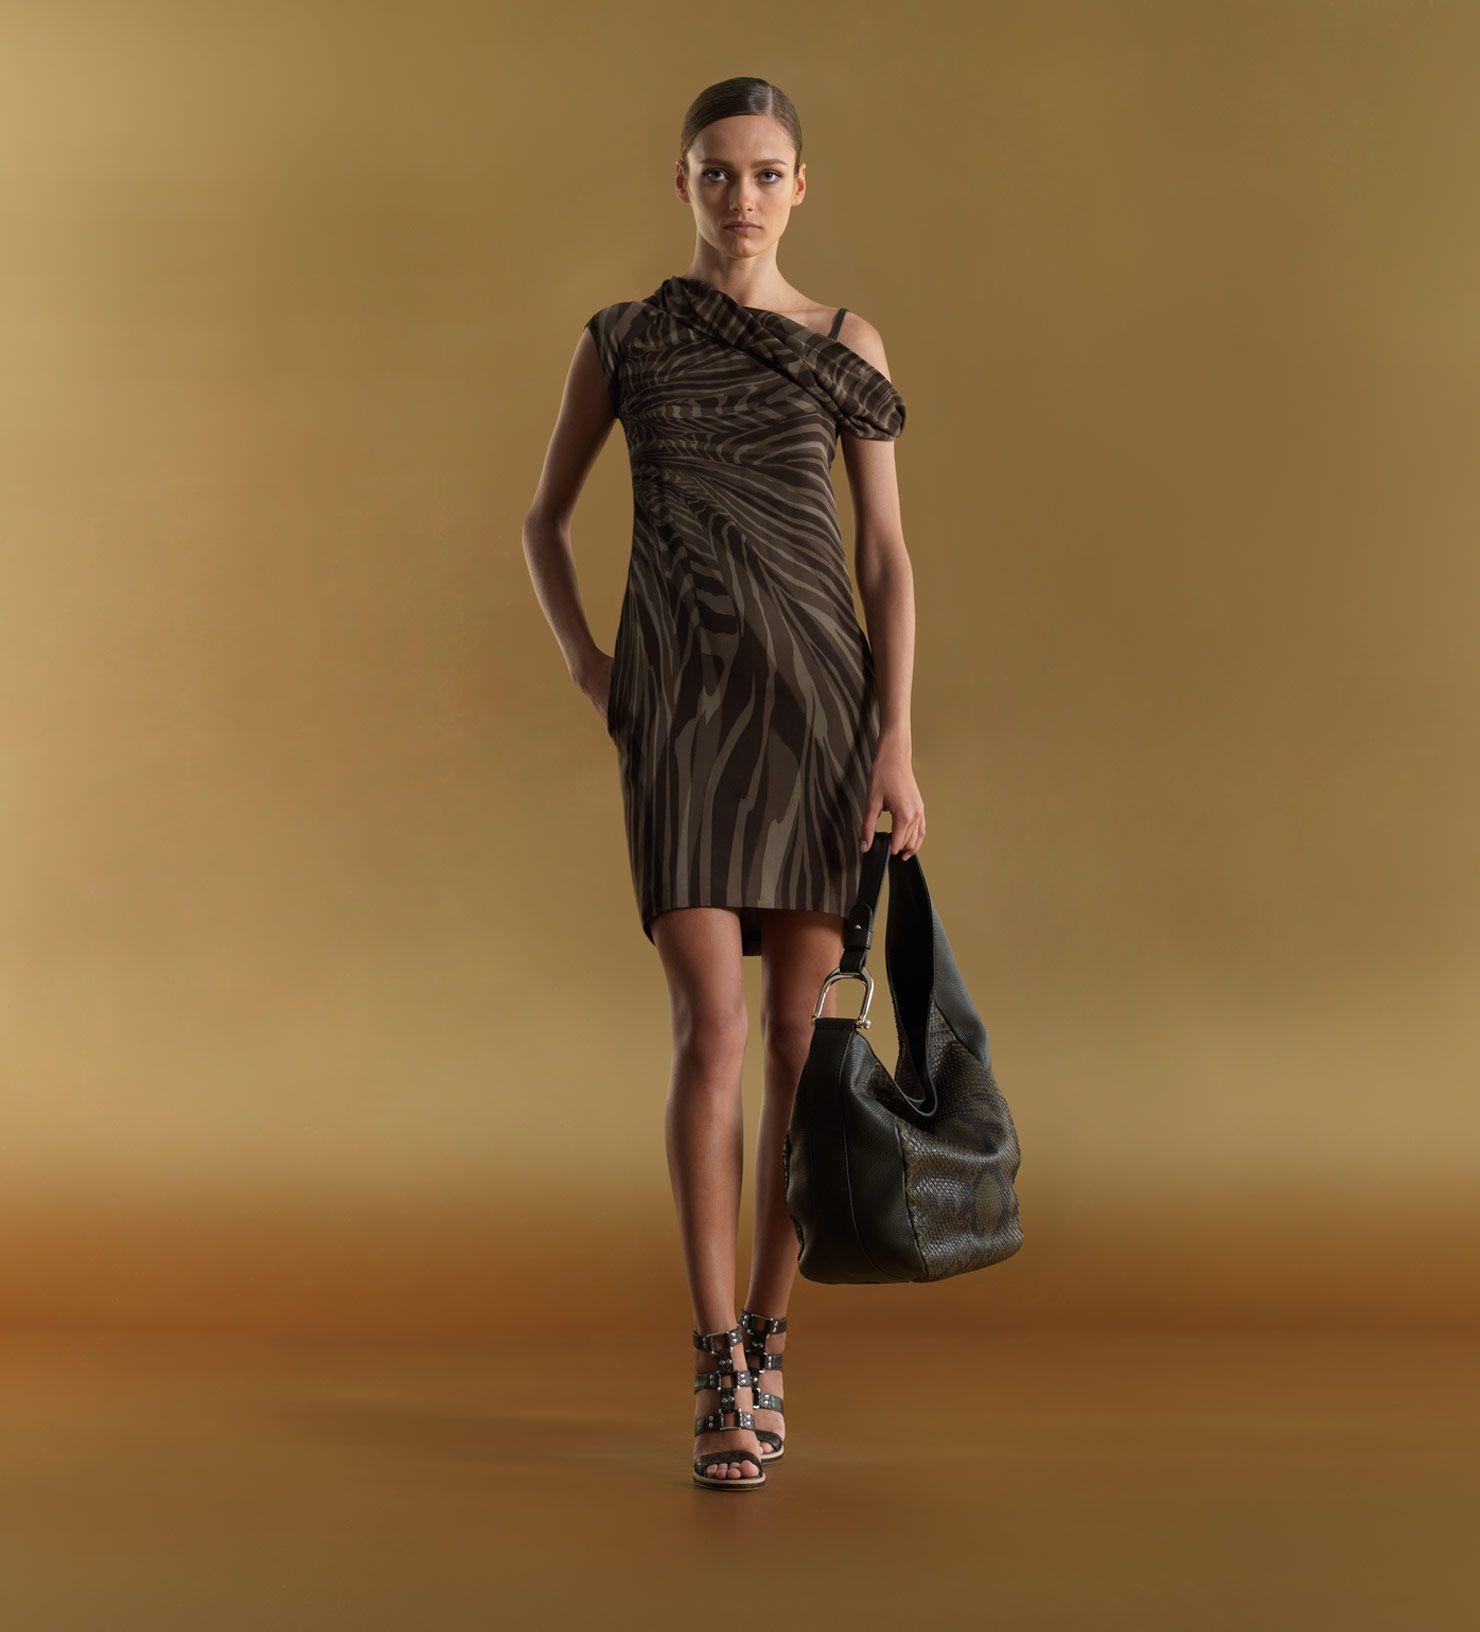 Fashion+gucci   Gucci womenu2019s twist neck dress with drapery print.   FASHION   Pinterest   Gucci ...